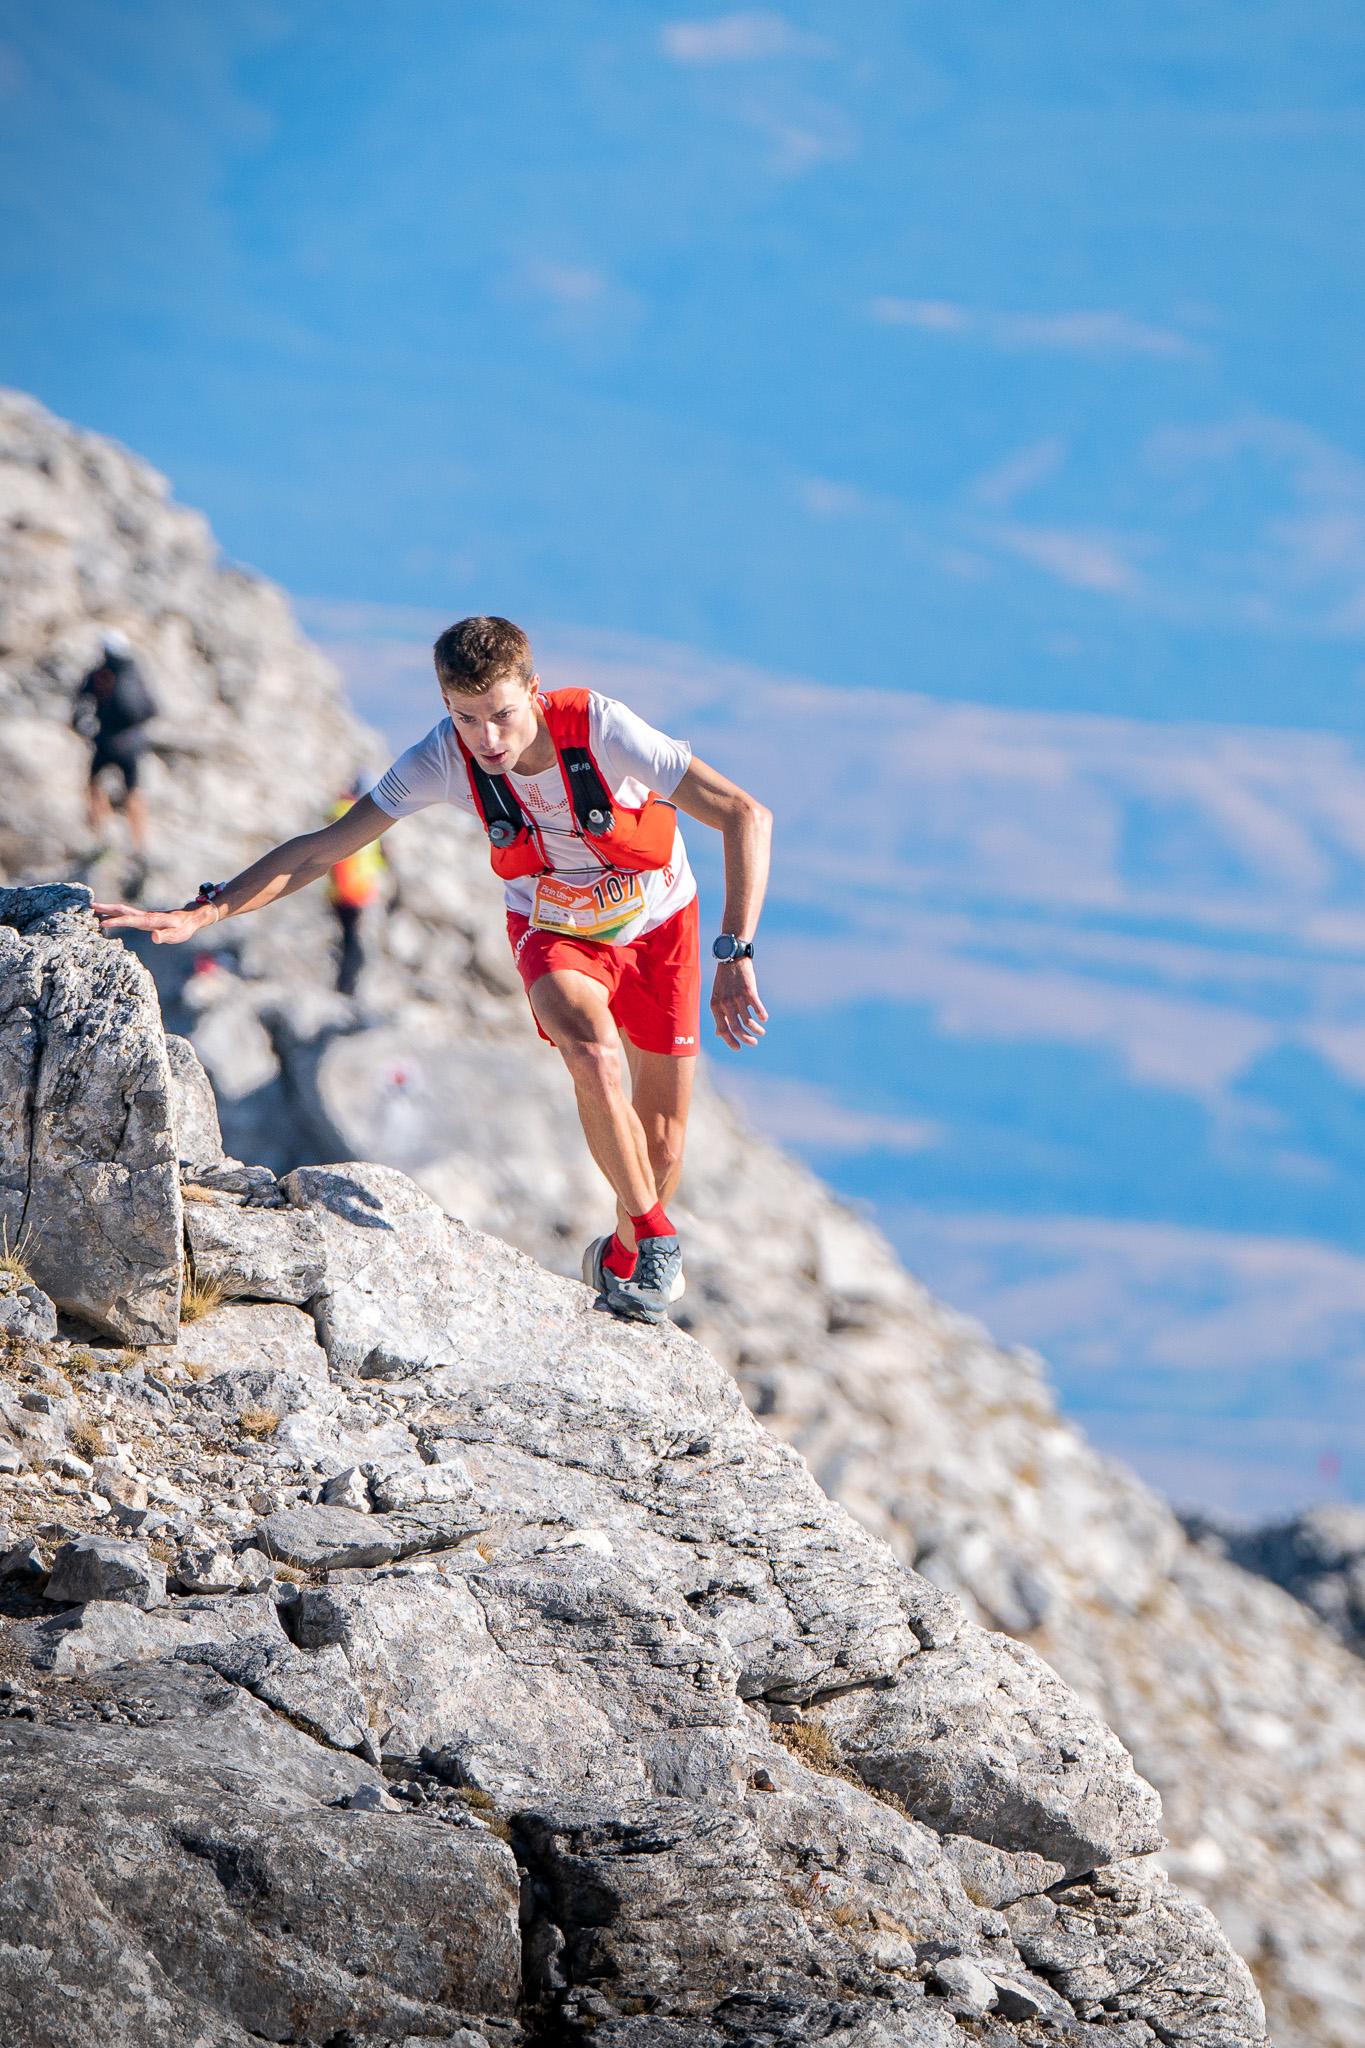 Jordi Alis, Pirin Extreme 2021 champion ©Alexander Valchev